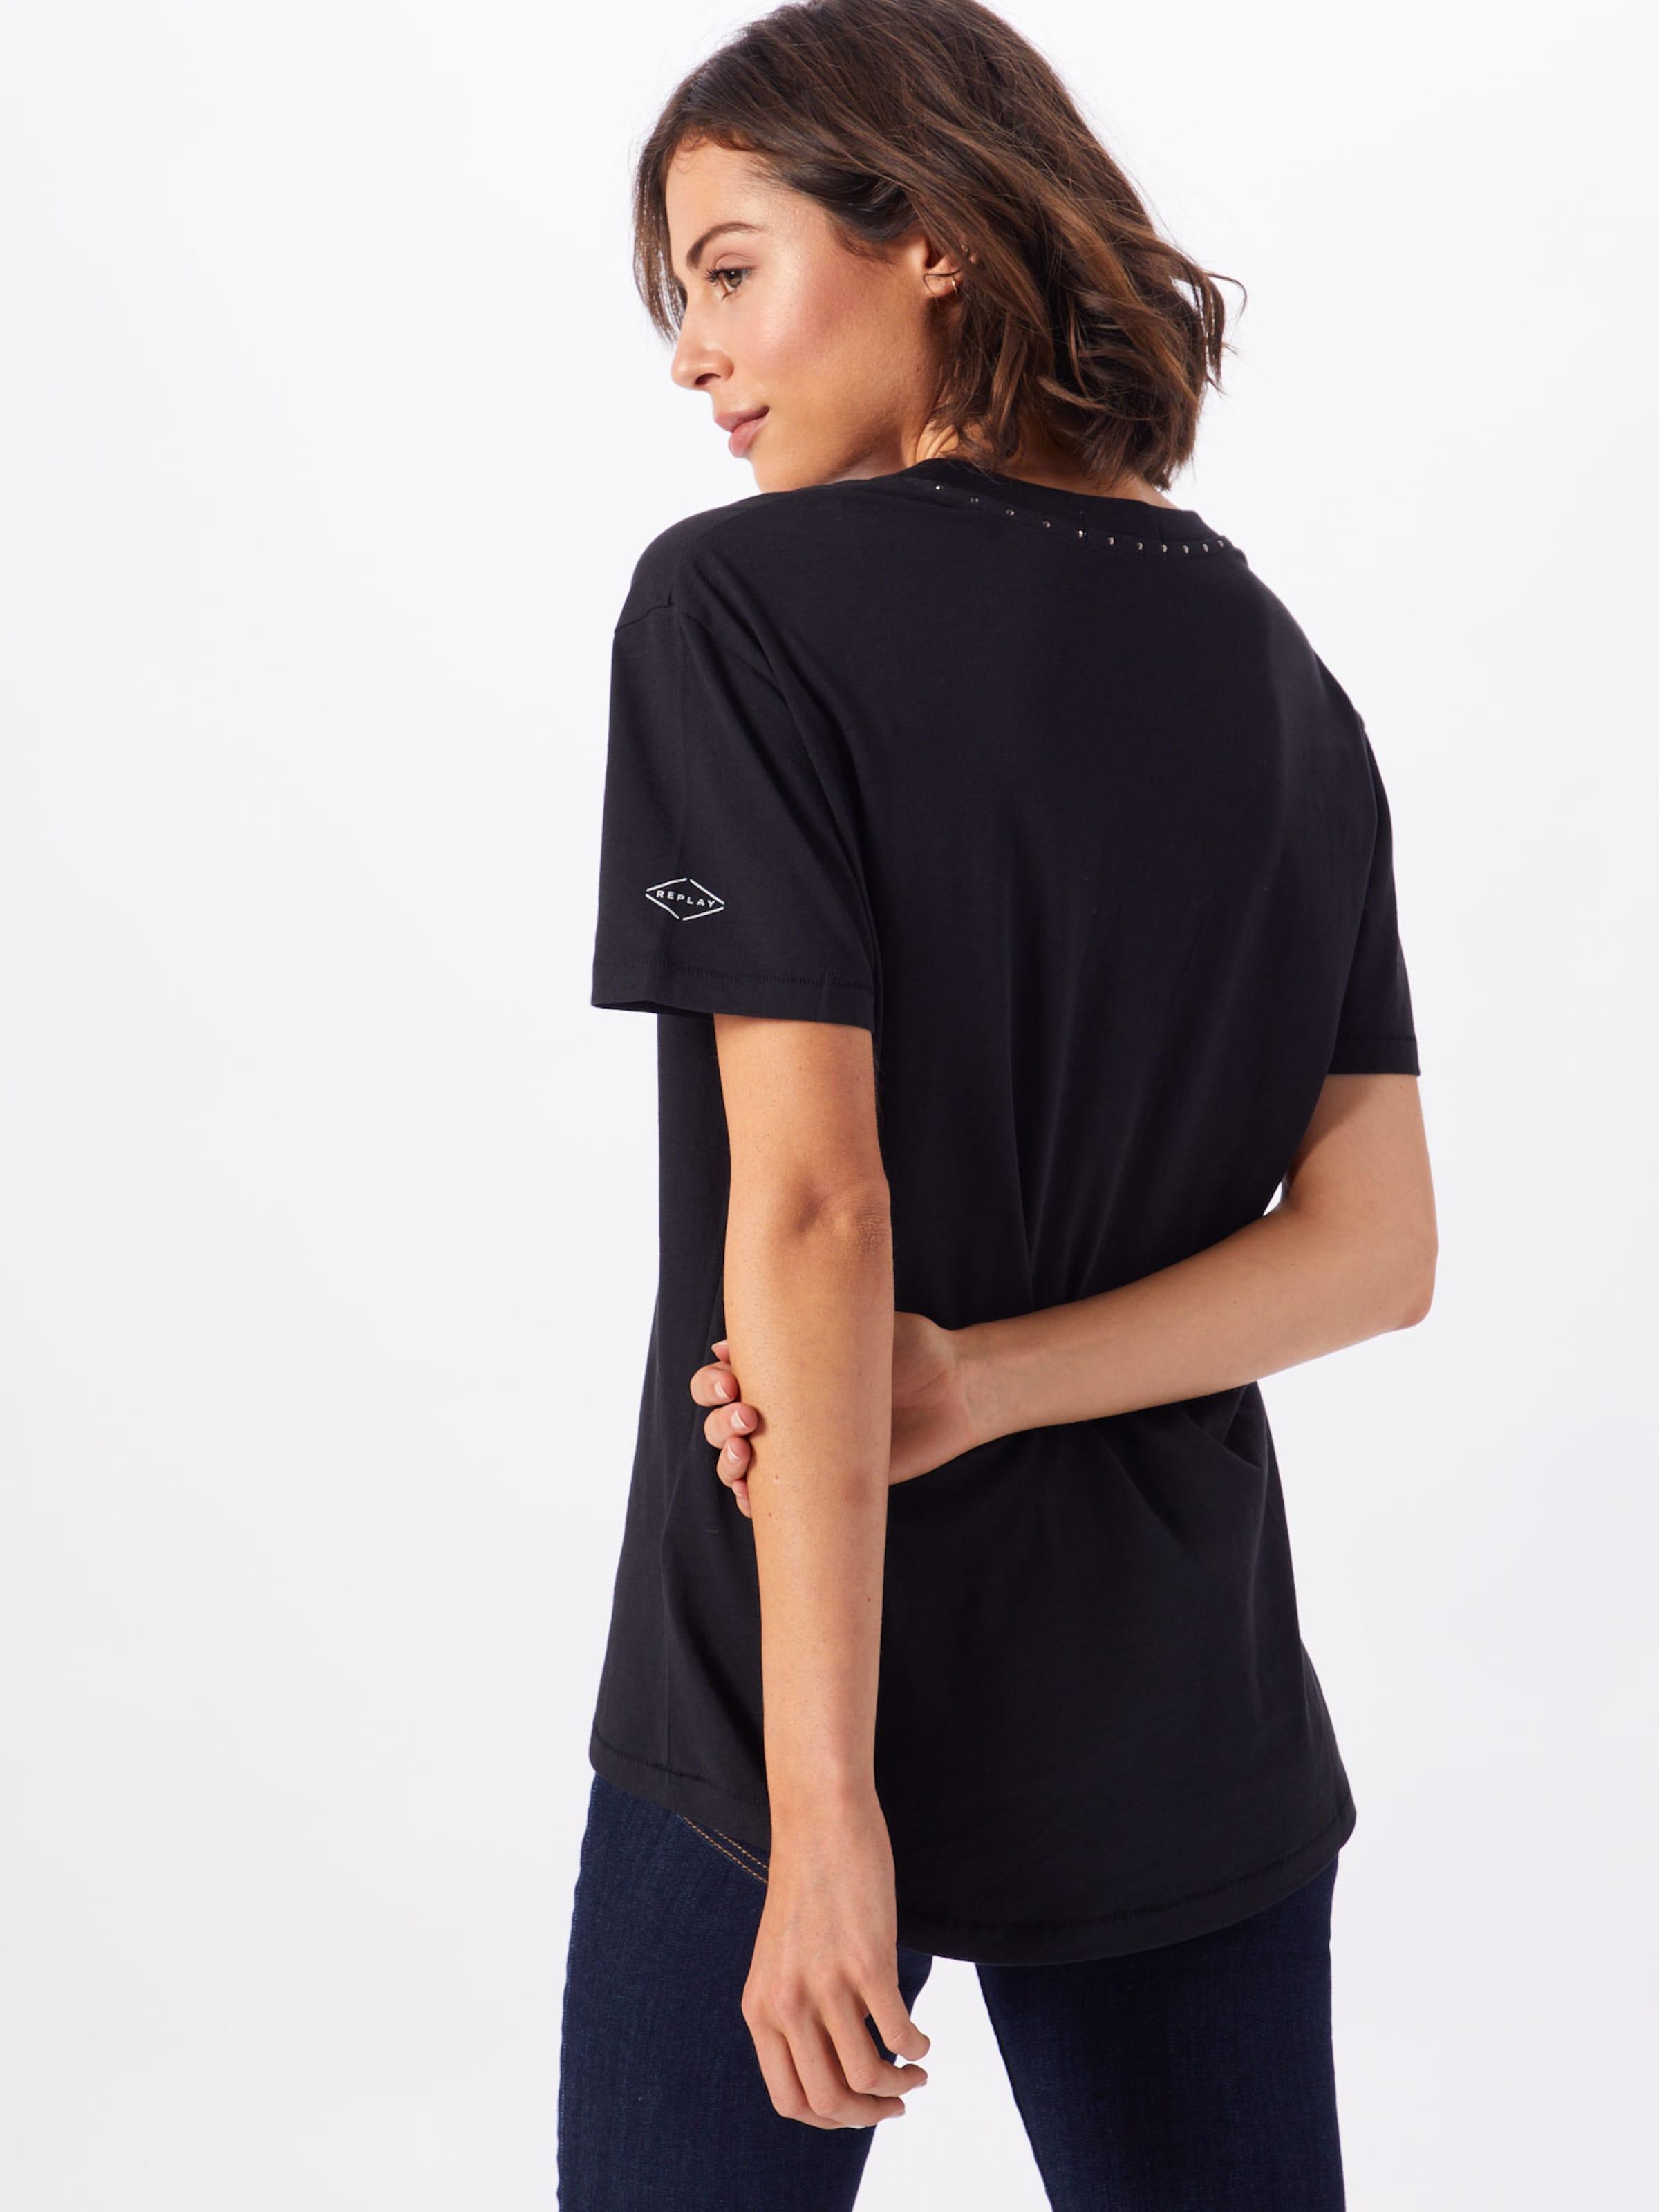 En Replay T Replay shirt Replay T Blanc shirt T Blanc En kXuZPi